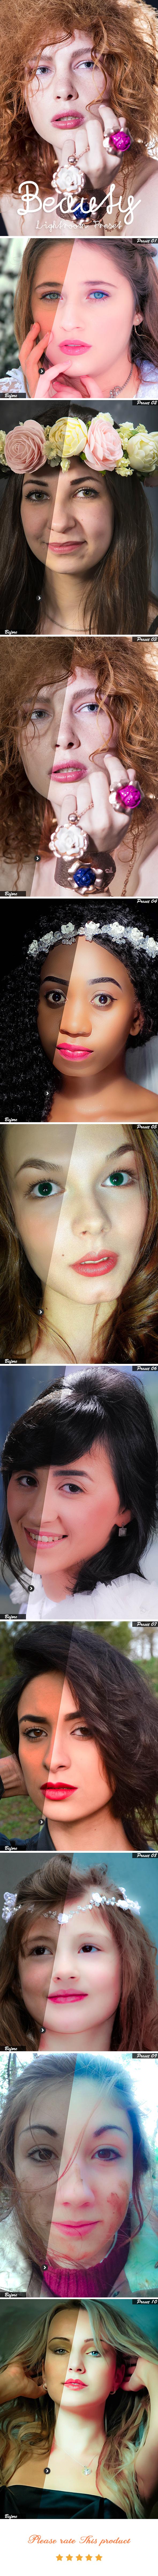 GraphicRiver Beauty Lightroom Preset 21188243